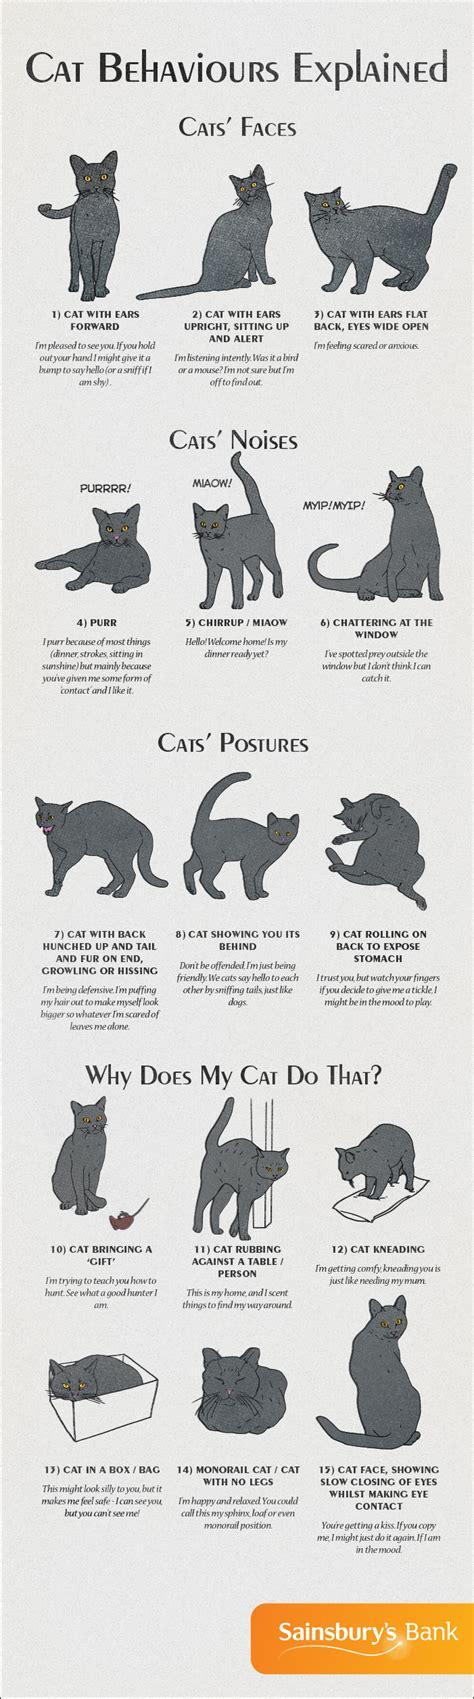 cat body language infographic images